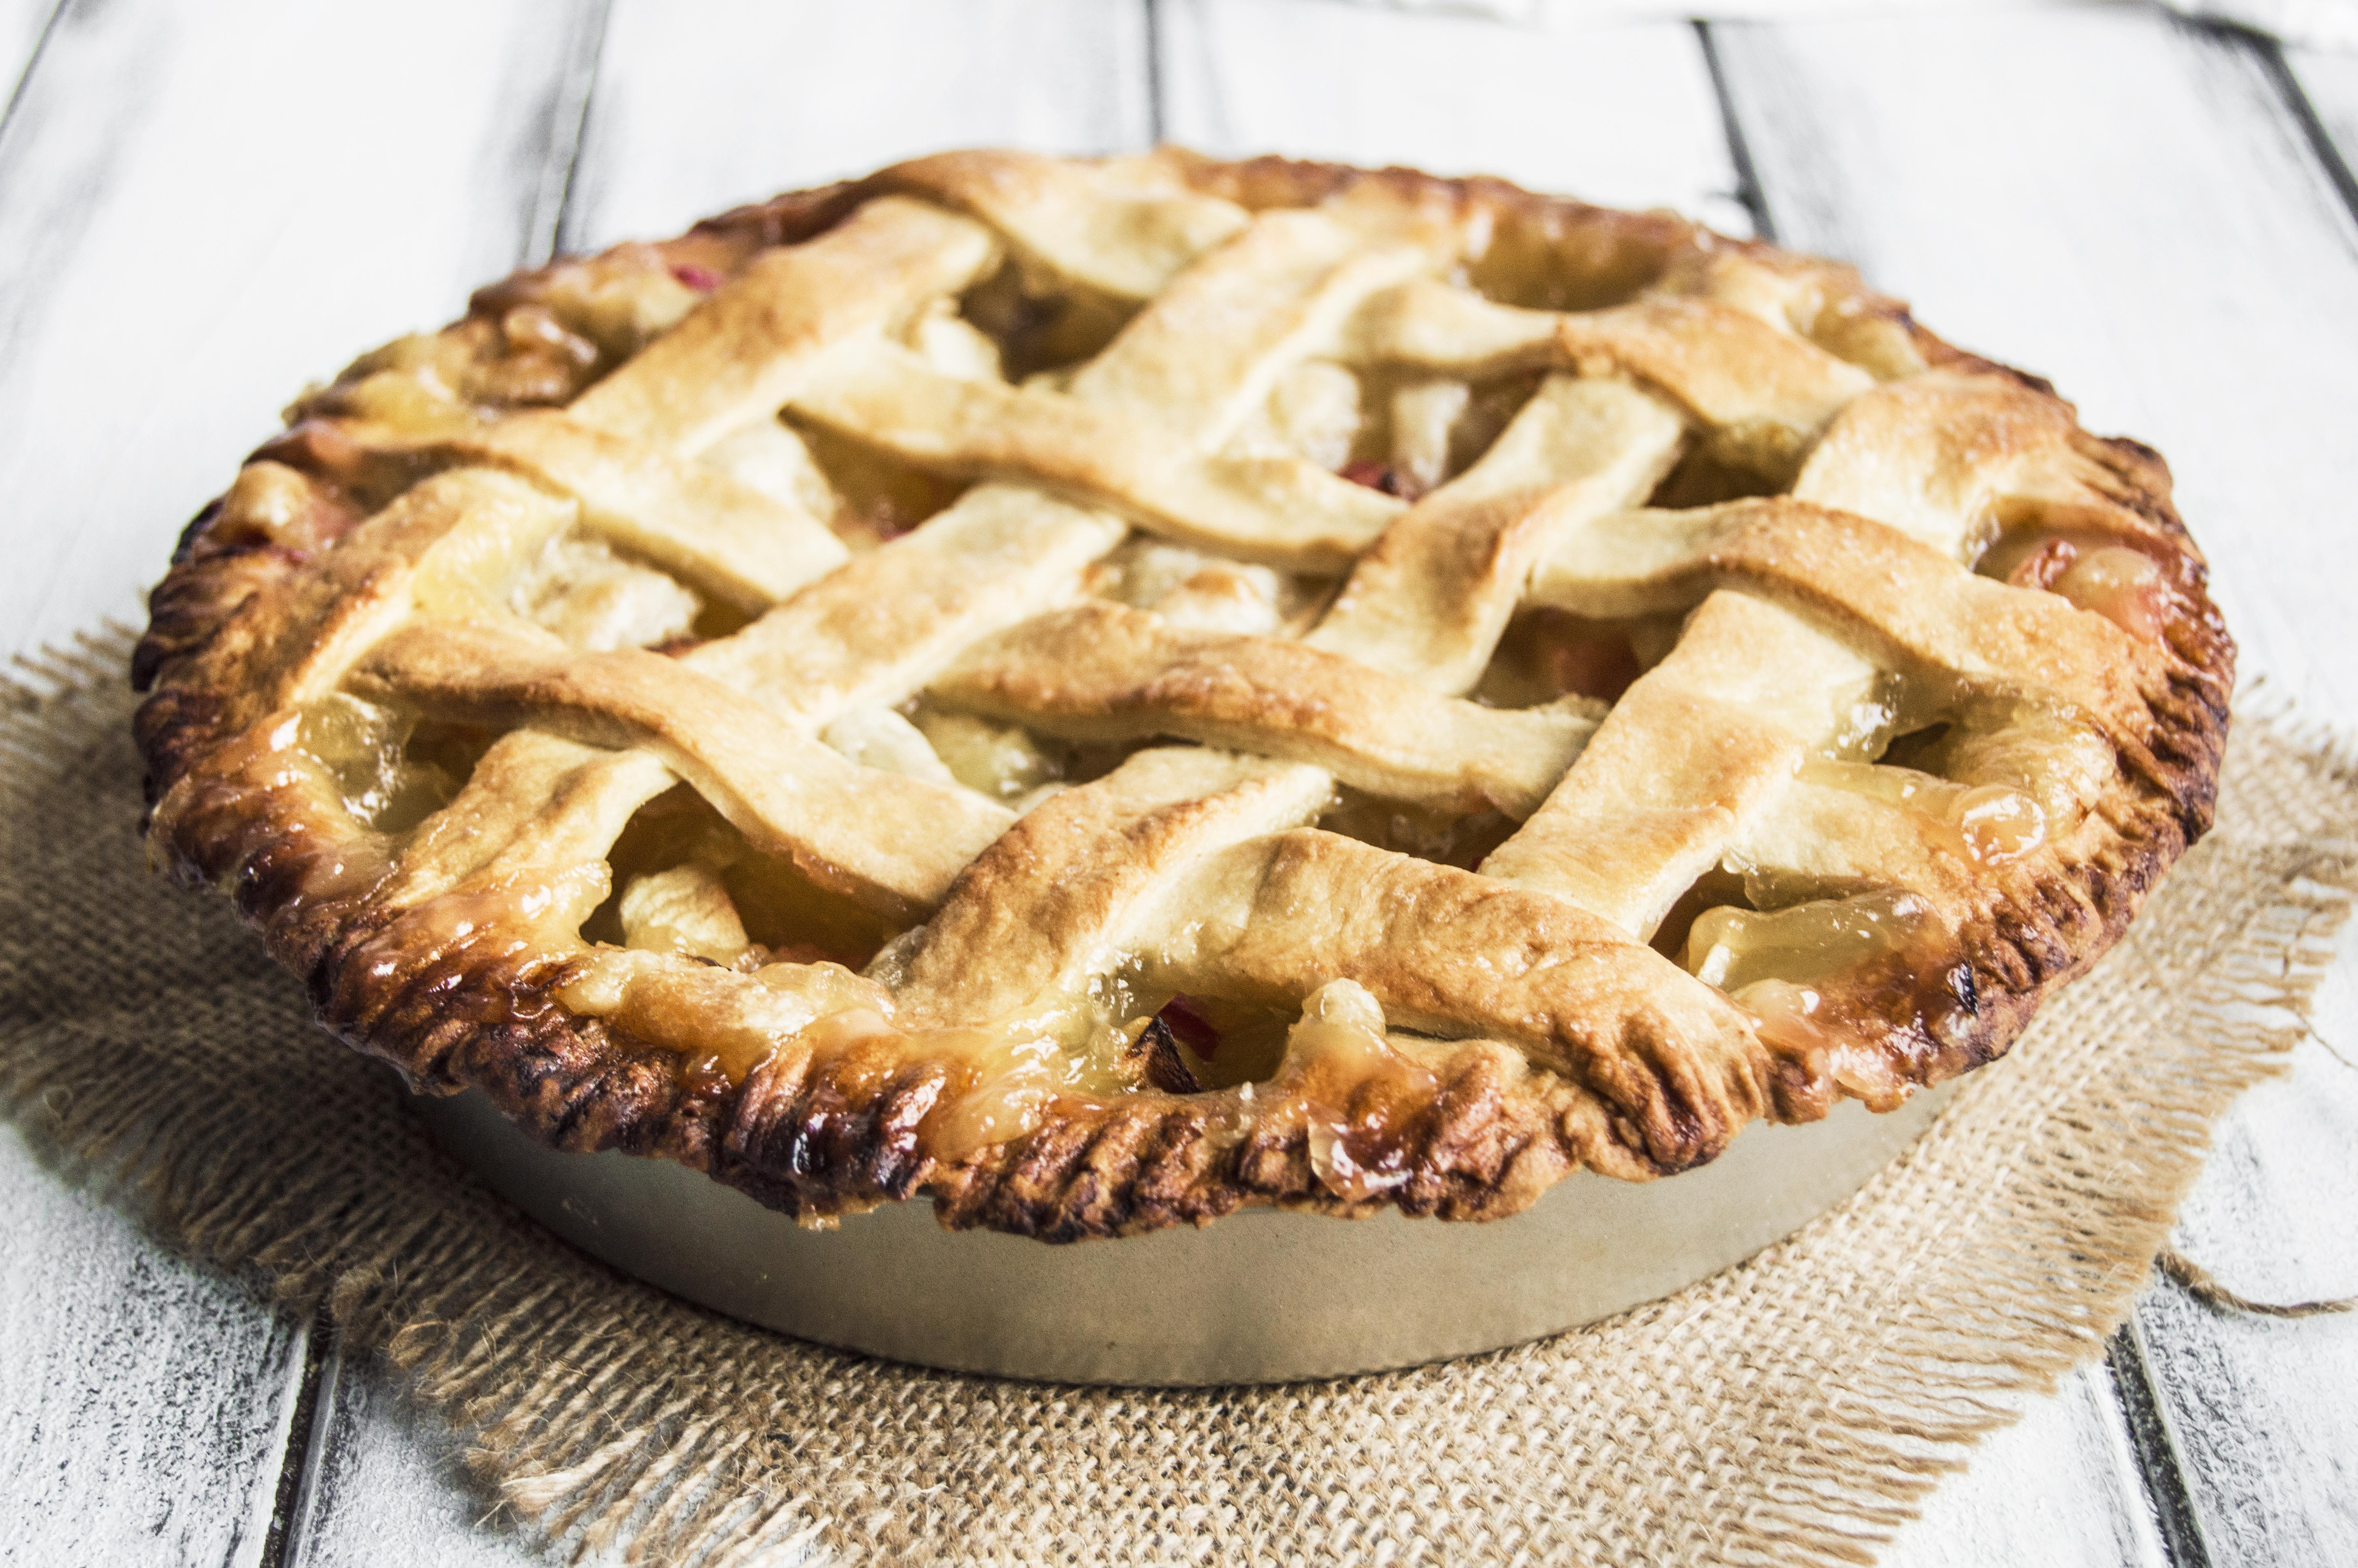 Apple Rhubarb Pie  Vegan Apple Rhubarb Pie My Vibrant Kitchen